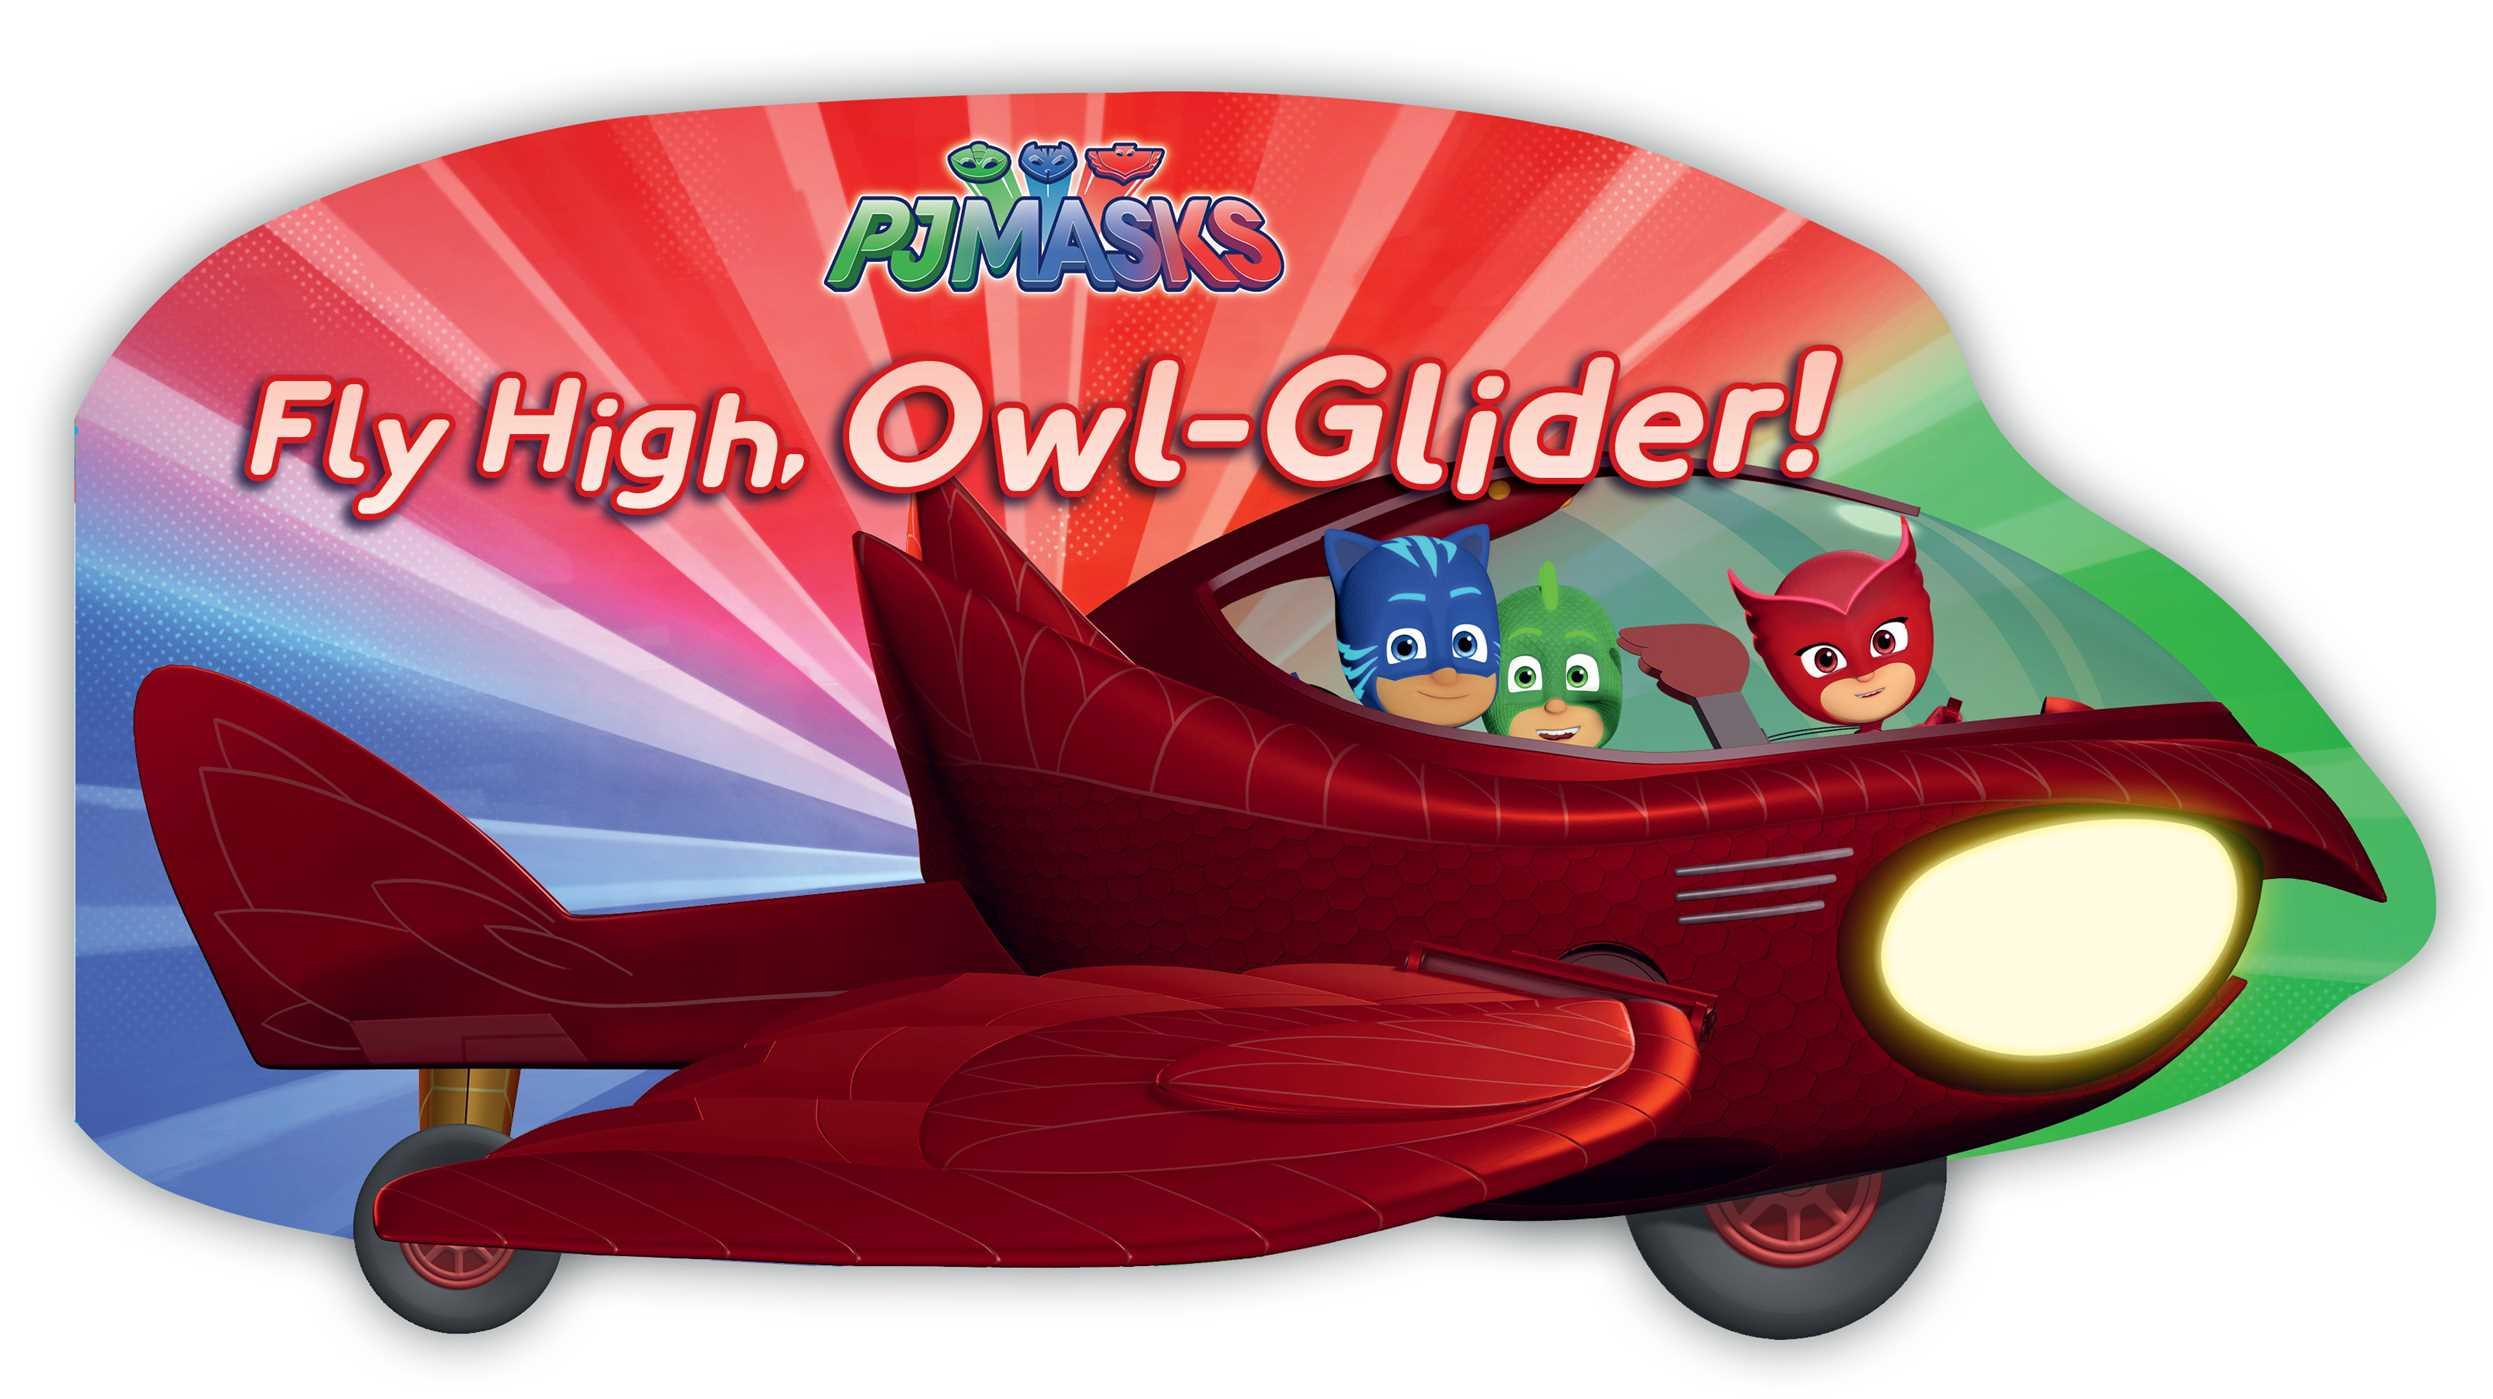 Fly High, Owl-Glider!